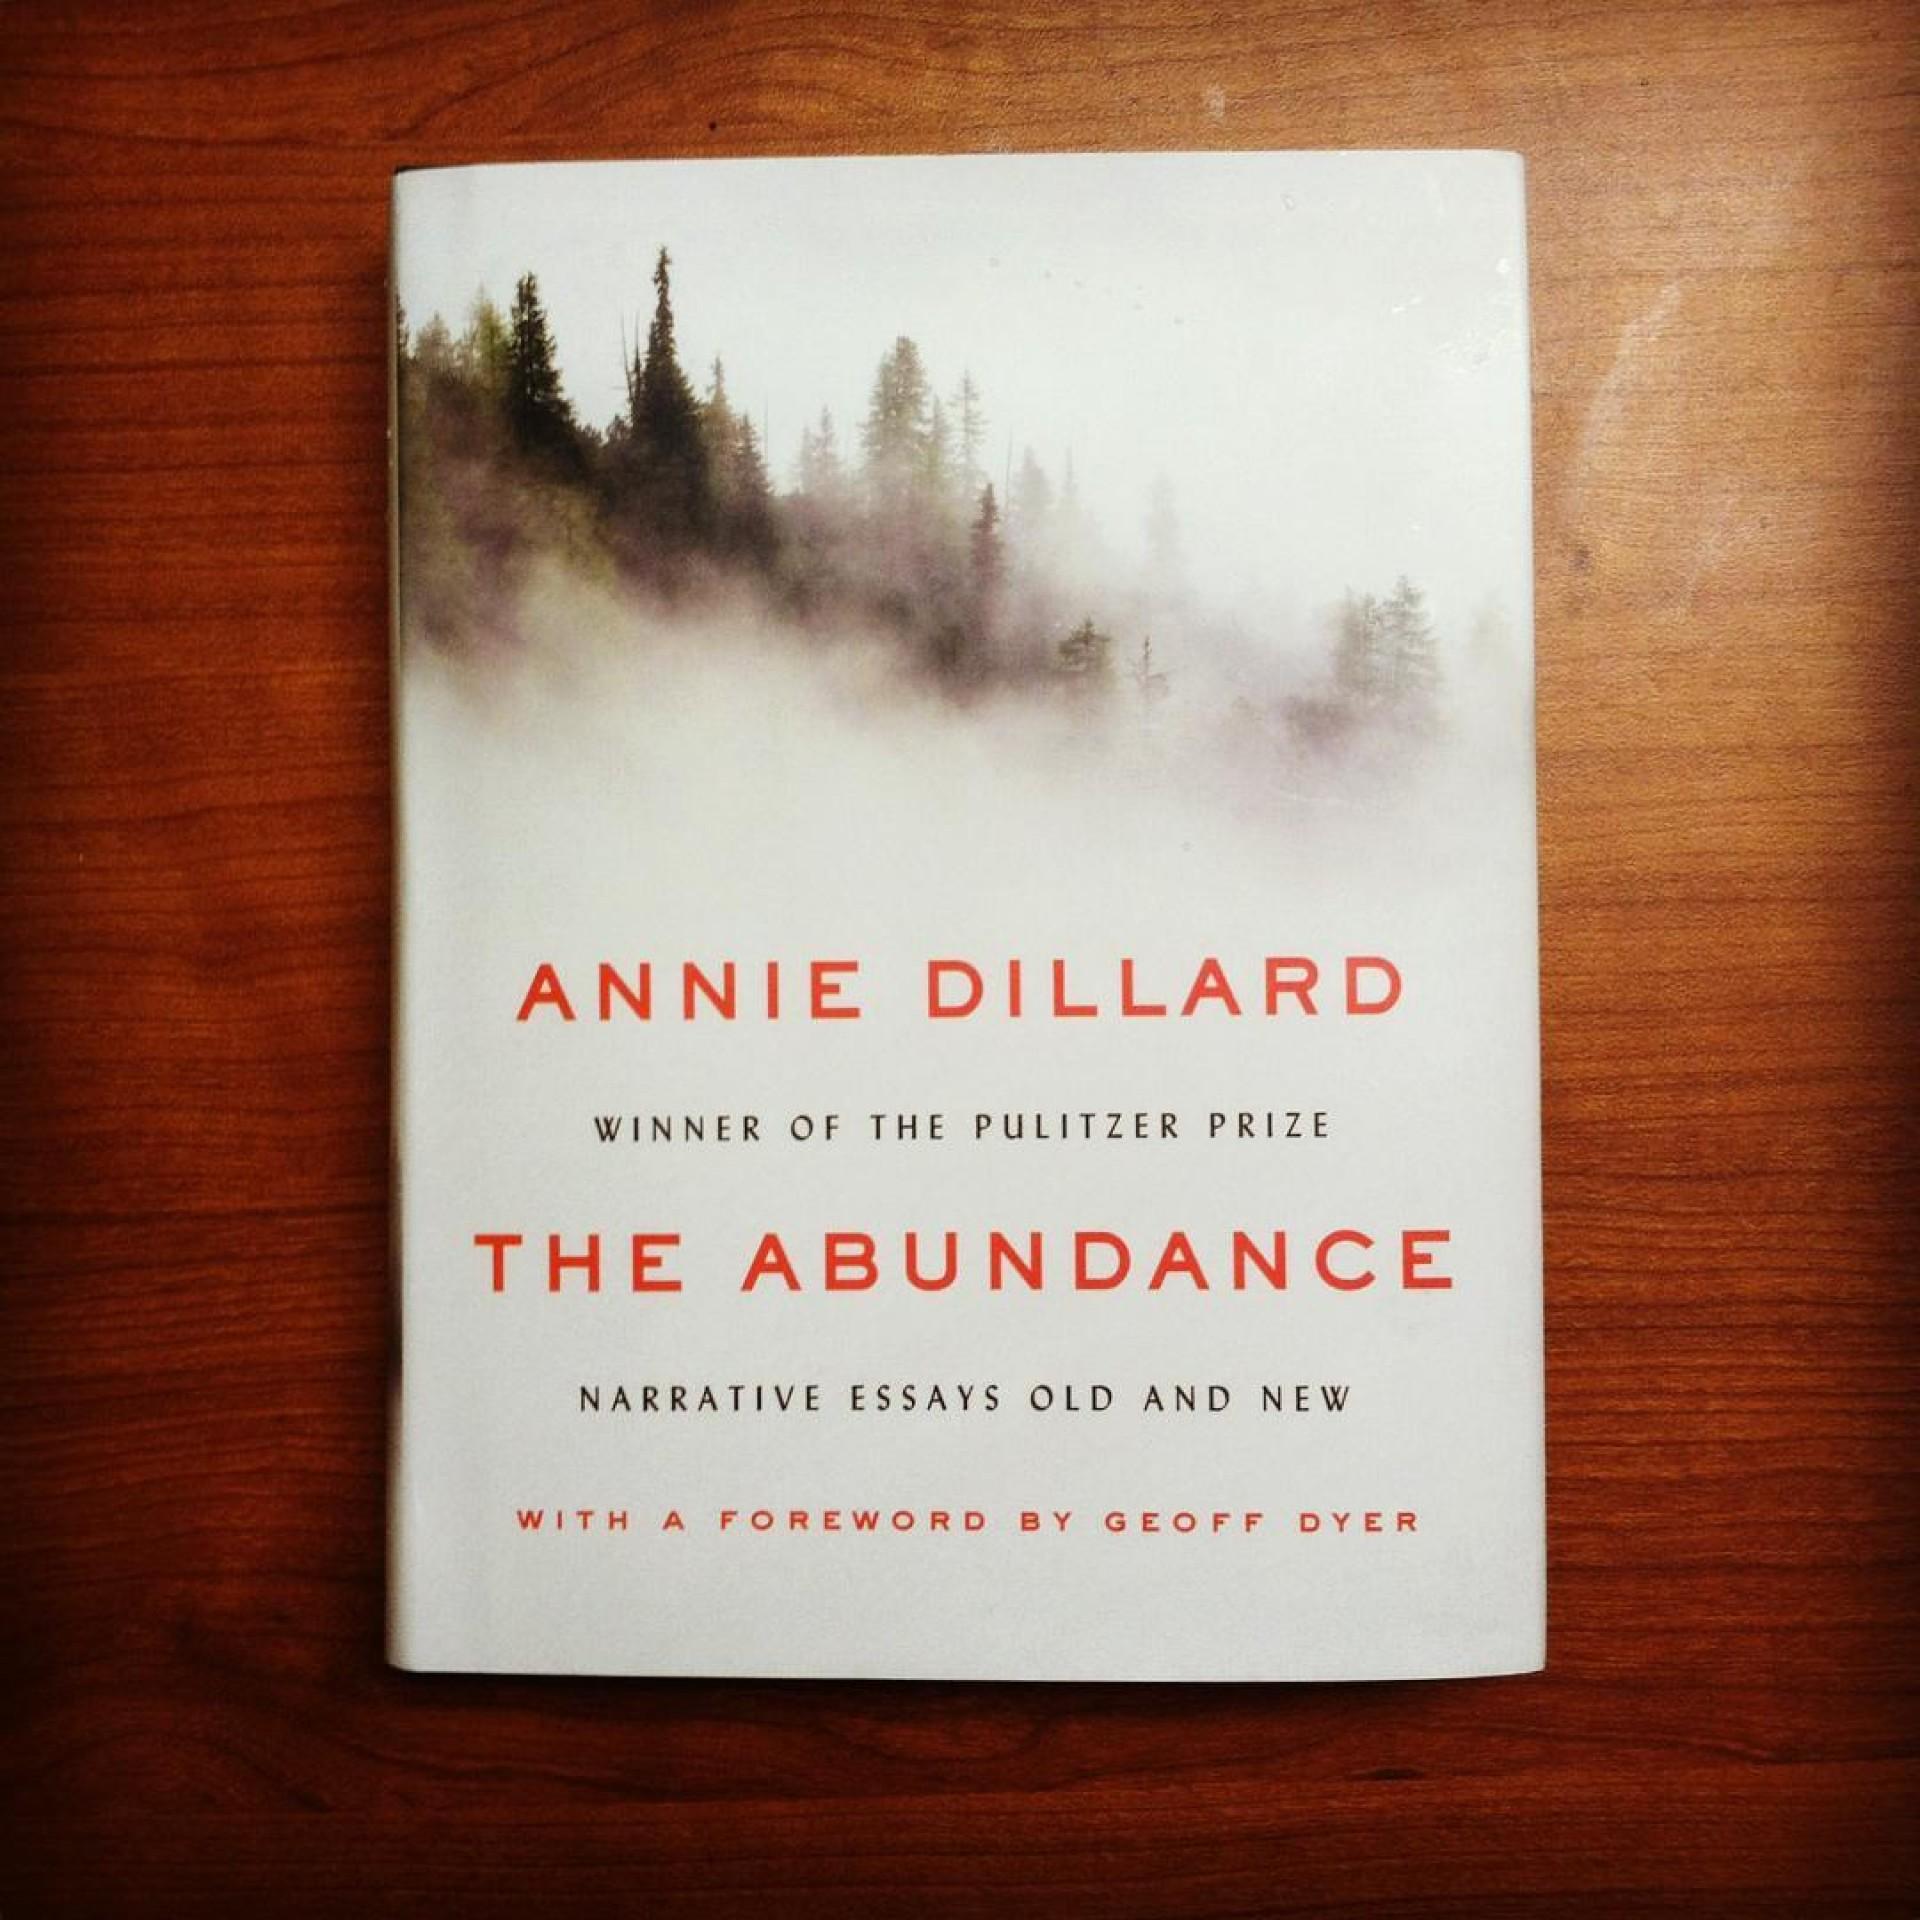 007 Essay Example Annie Dillard Essays 12841172 10154021501742277 2773462023536637215 O Stirring Stunt Pilot Pdf An American Childhood 1920